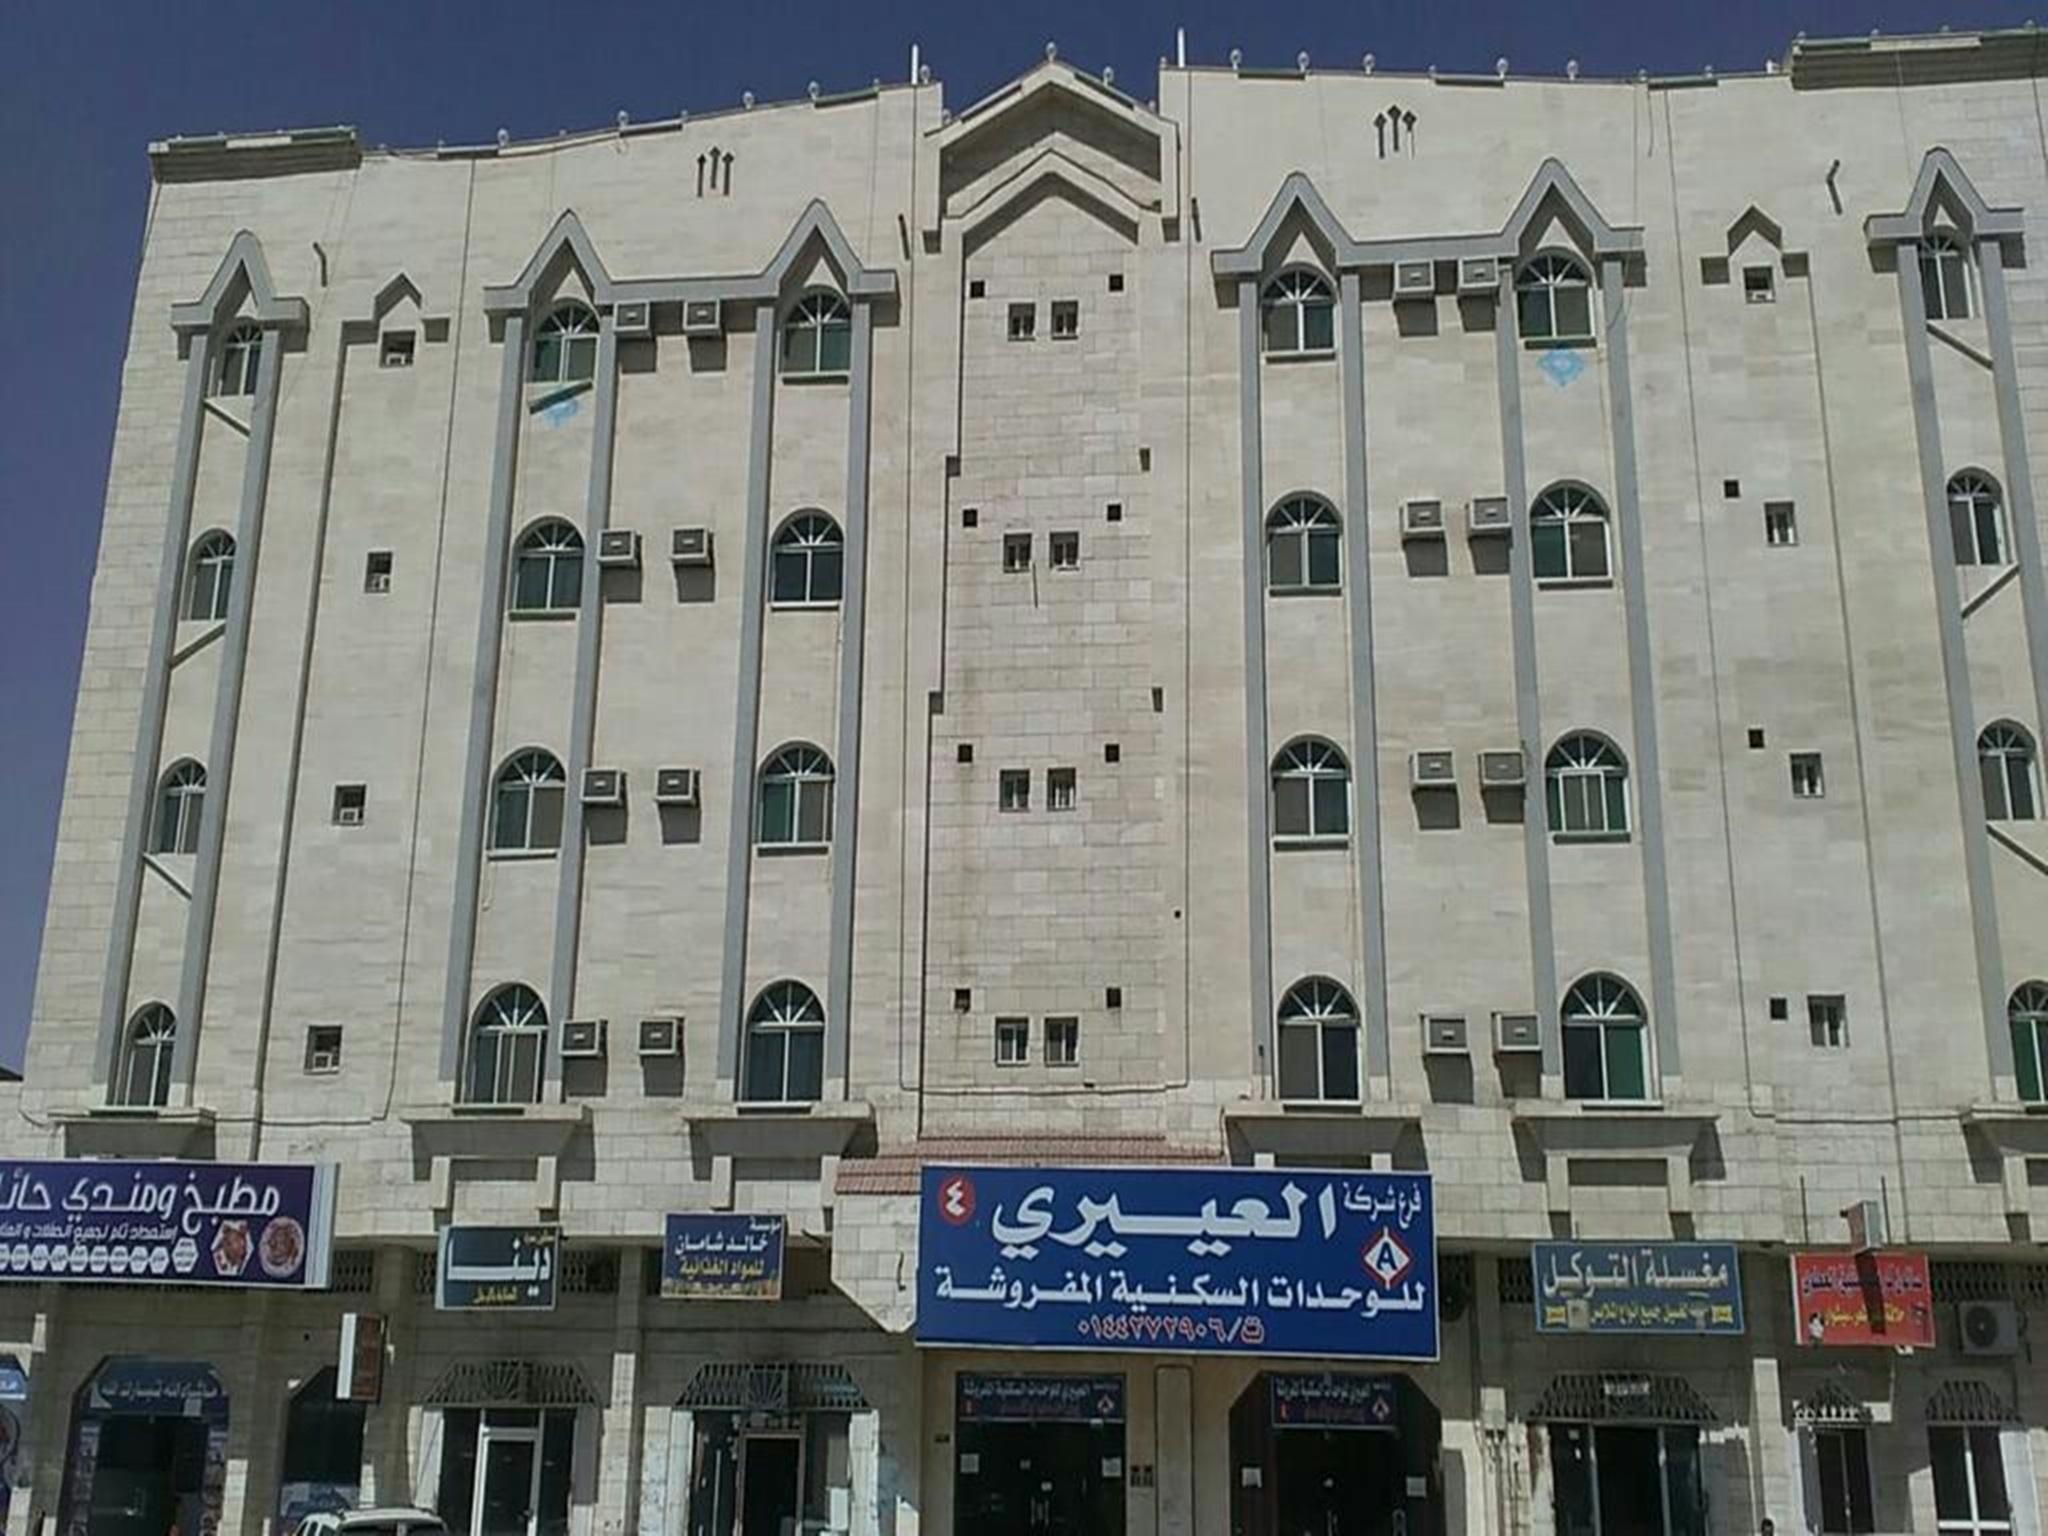 Al Eairy Apartments Tabuk 4